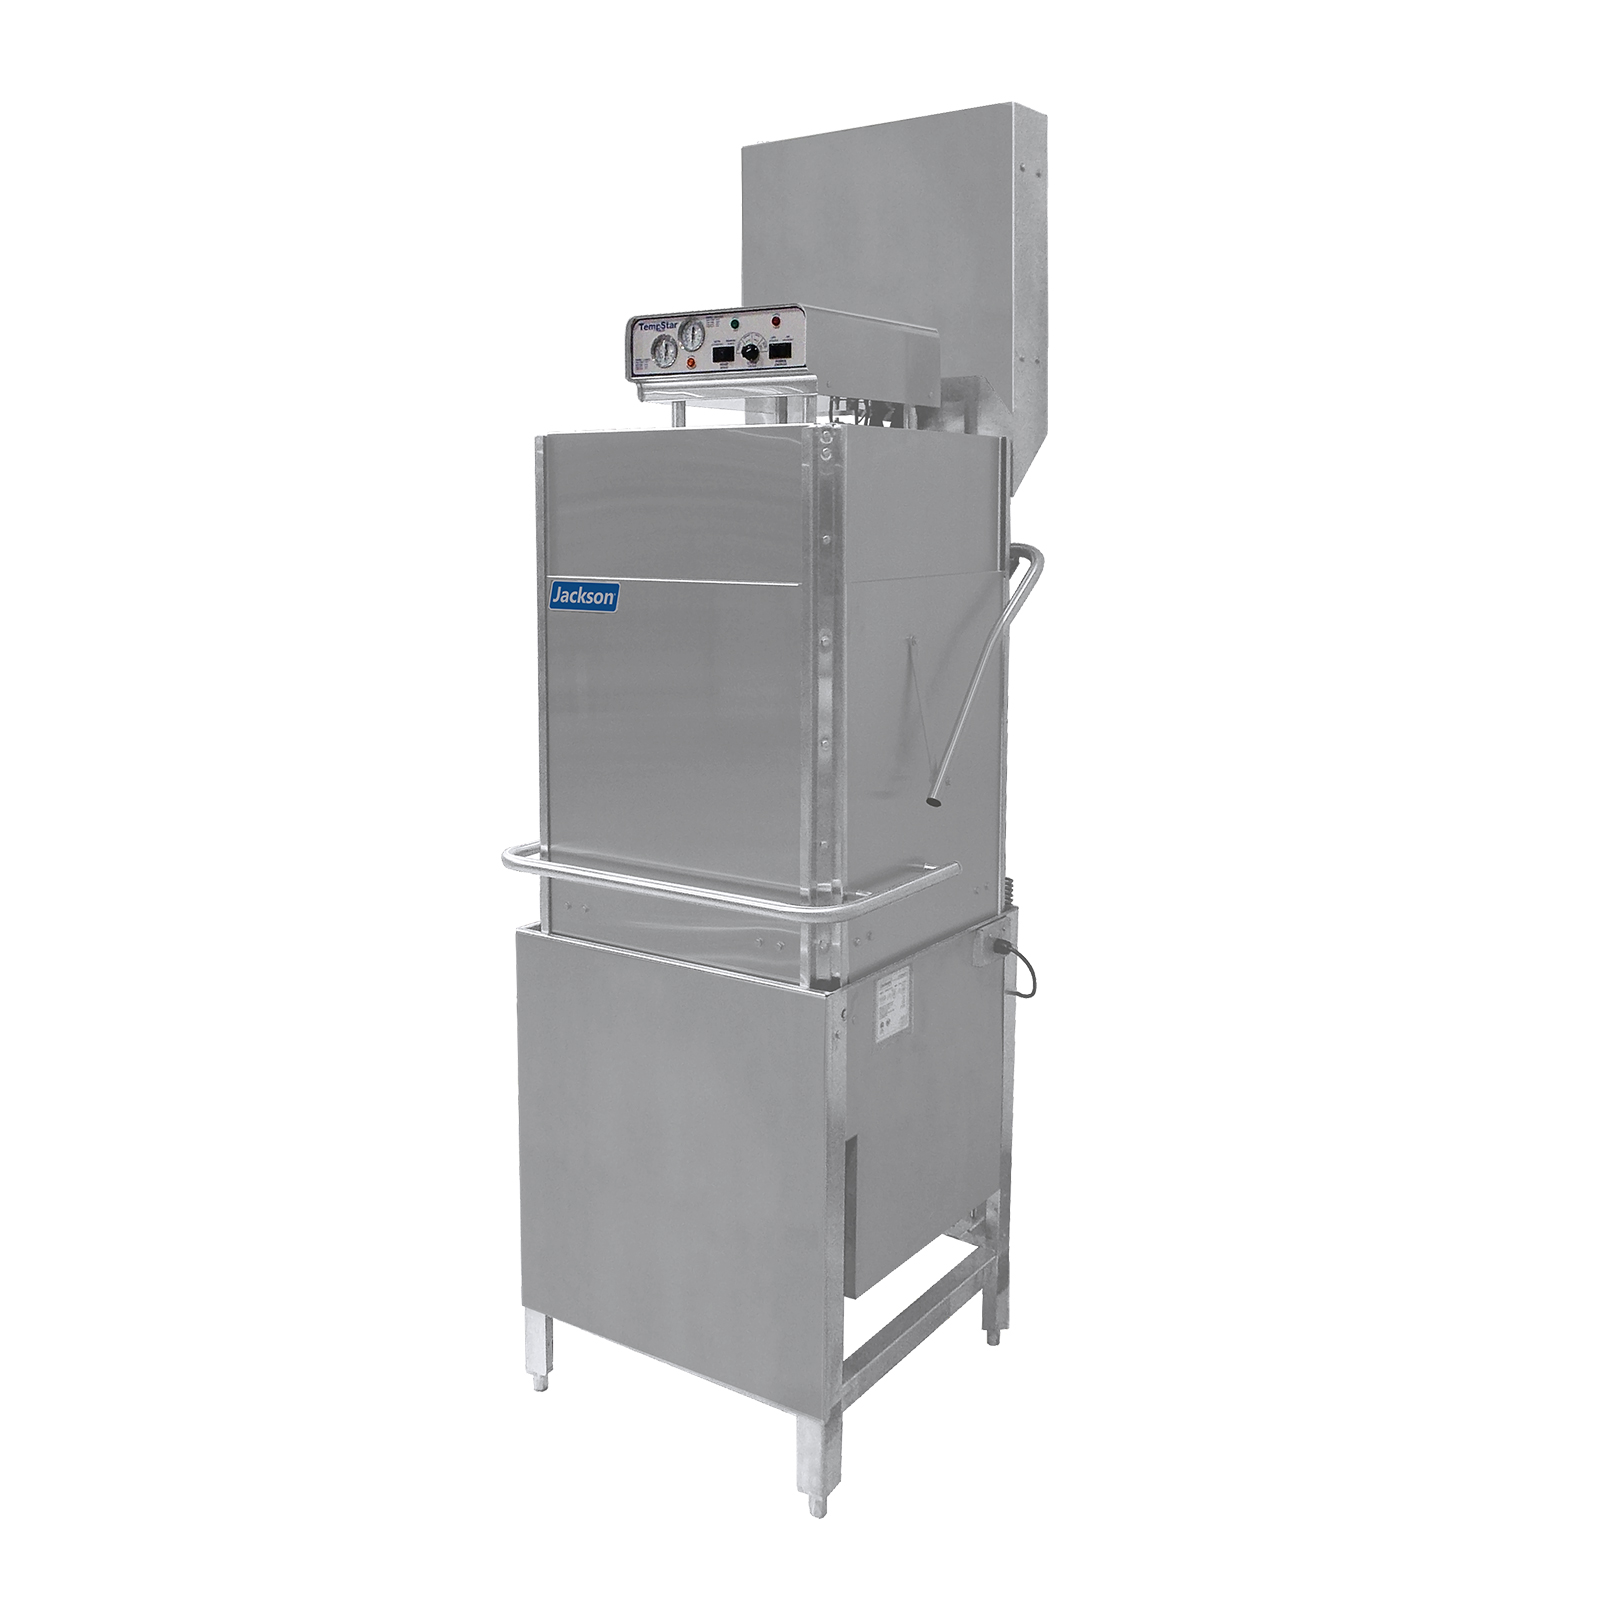 Jackson Tempstar Hh E Ventless Dishwasher High Hood Door Type